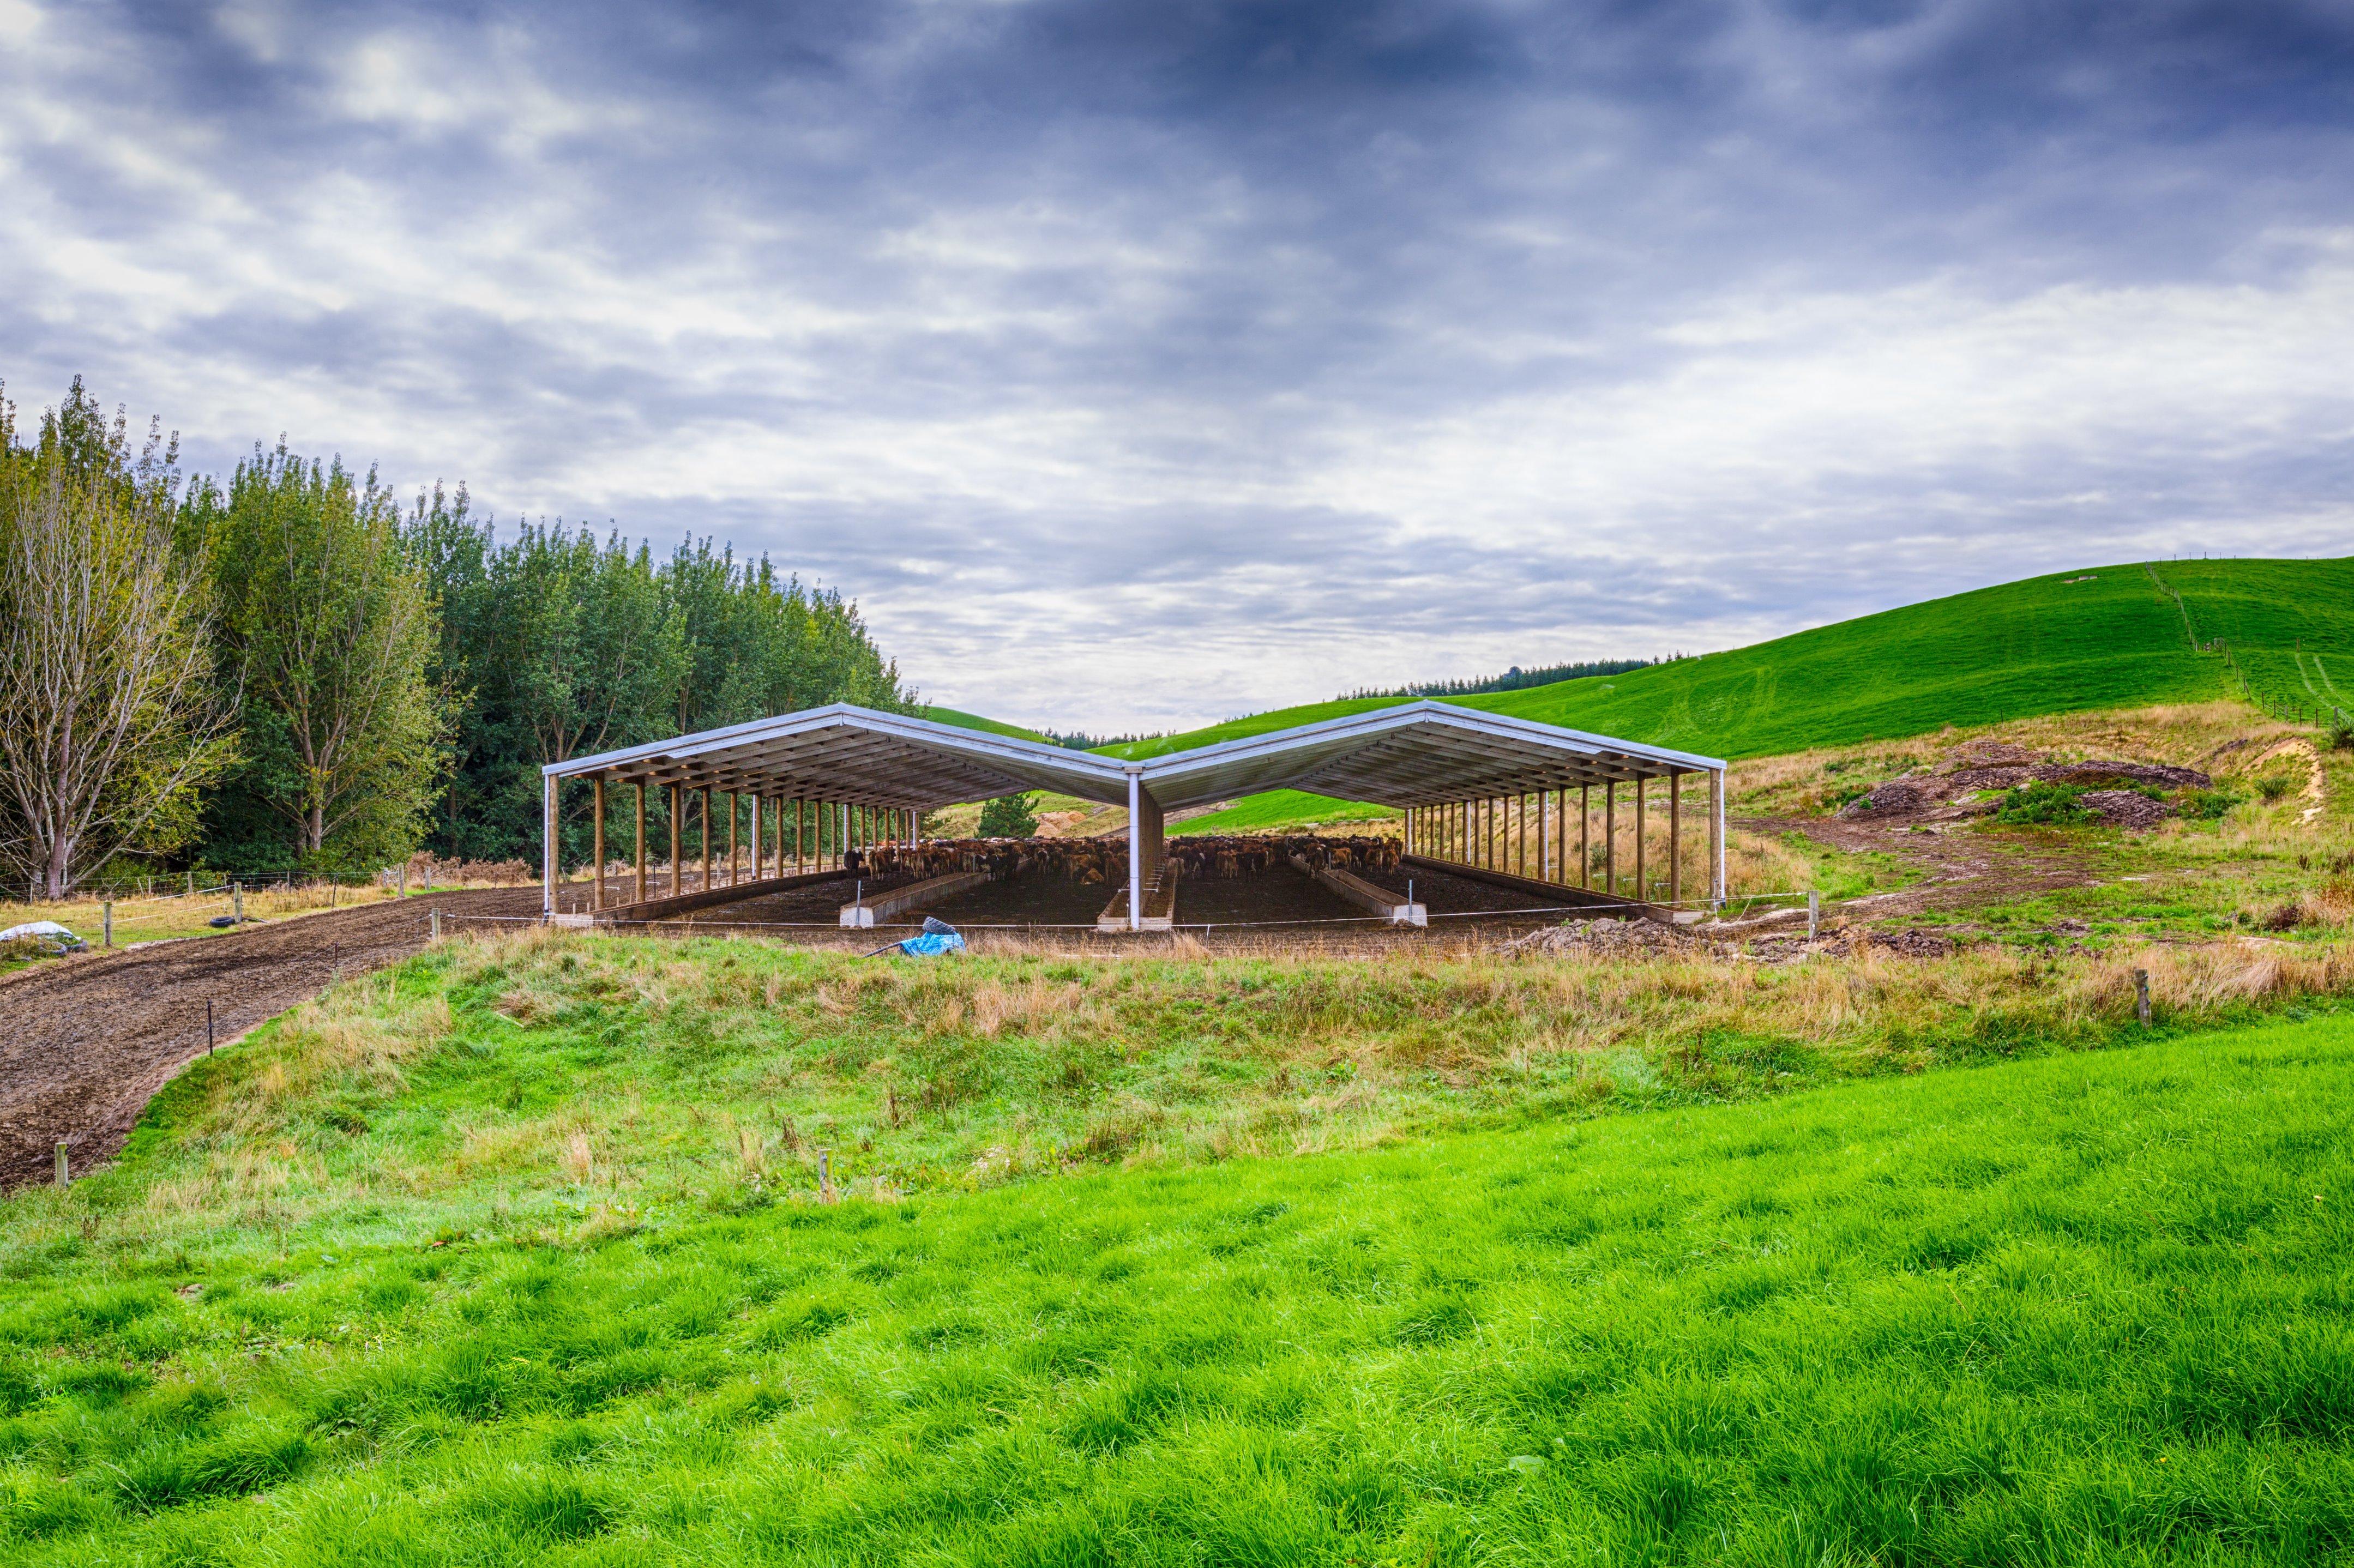 Alpine animal shelter shed in the NZ landscape